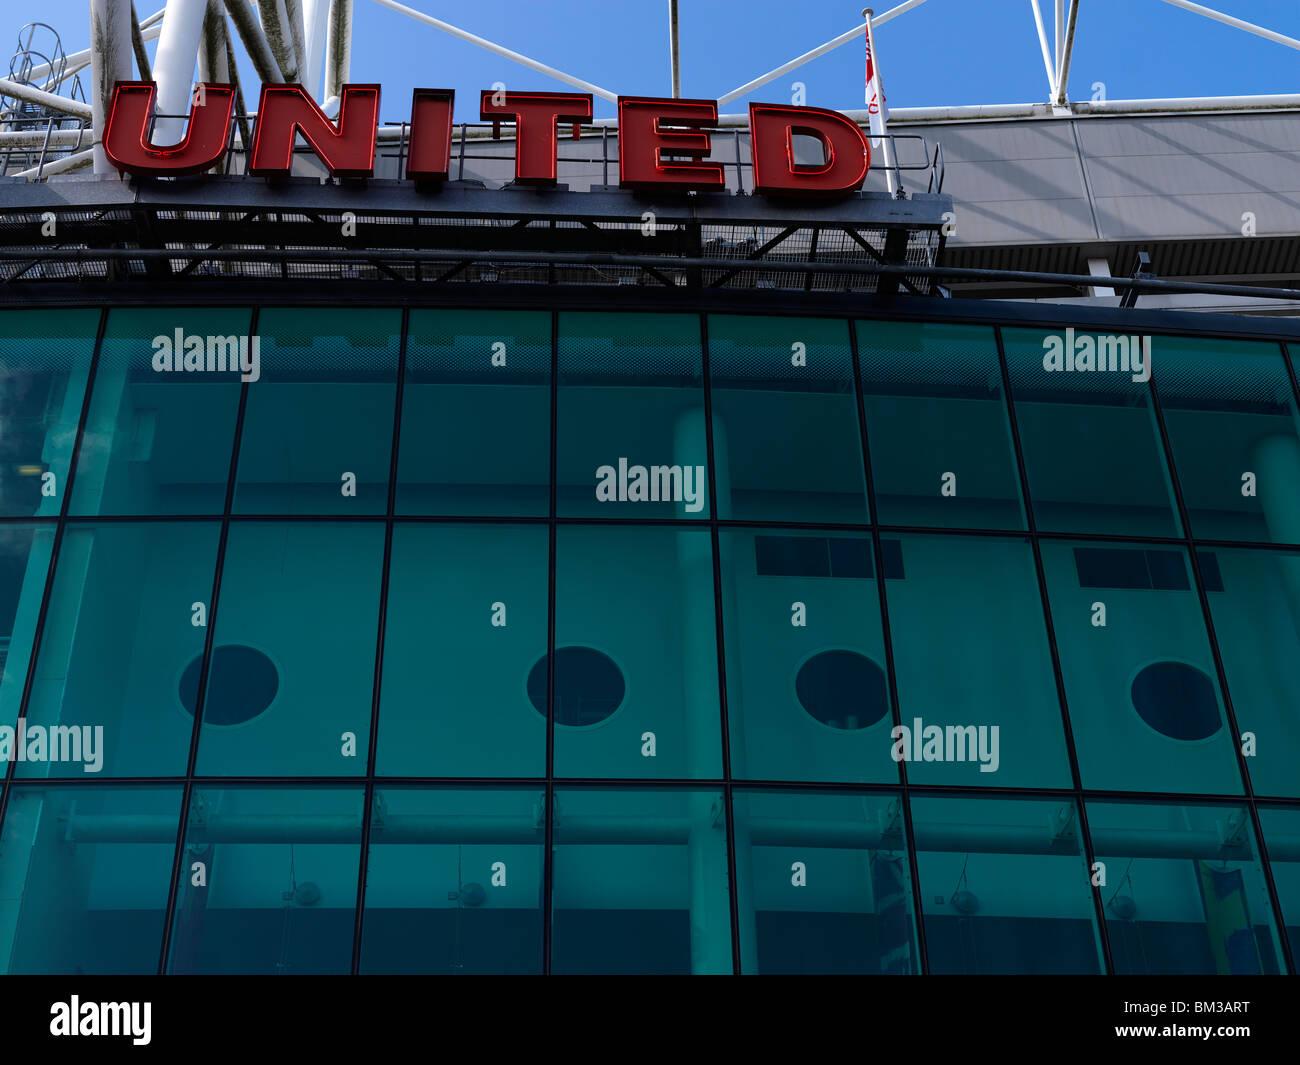 old trafford stadium - Stock Image